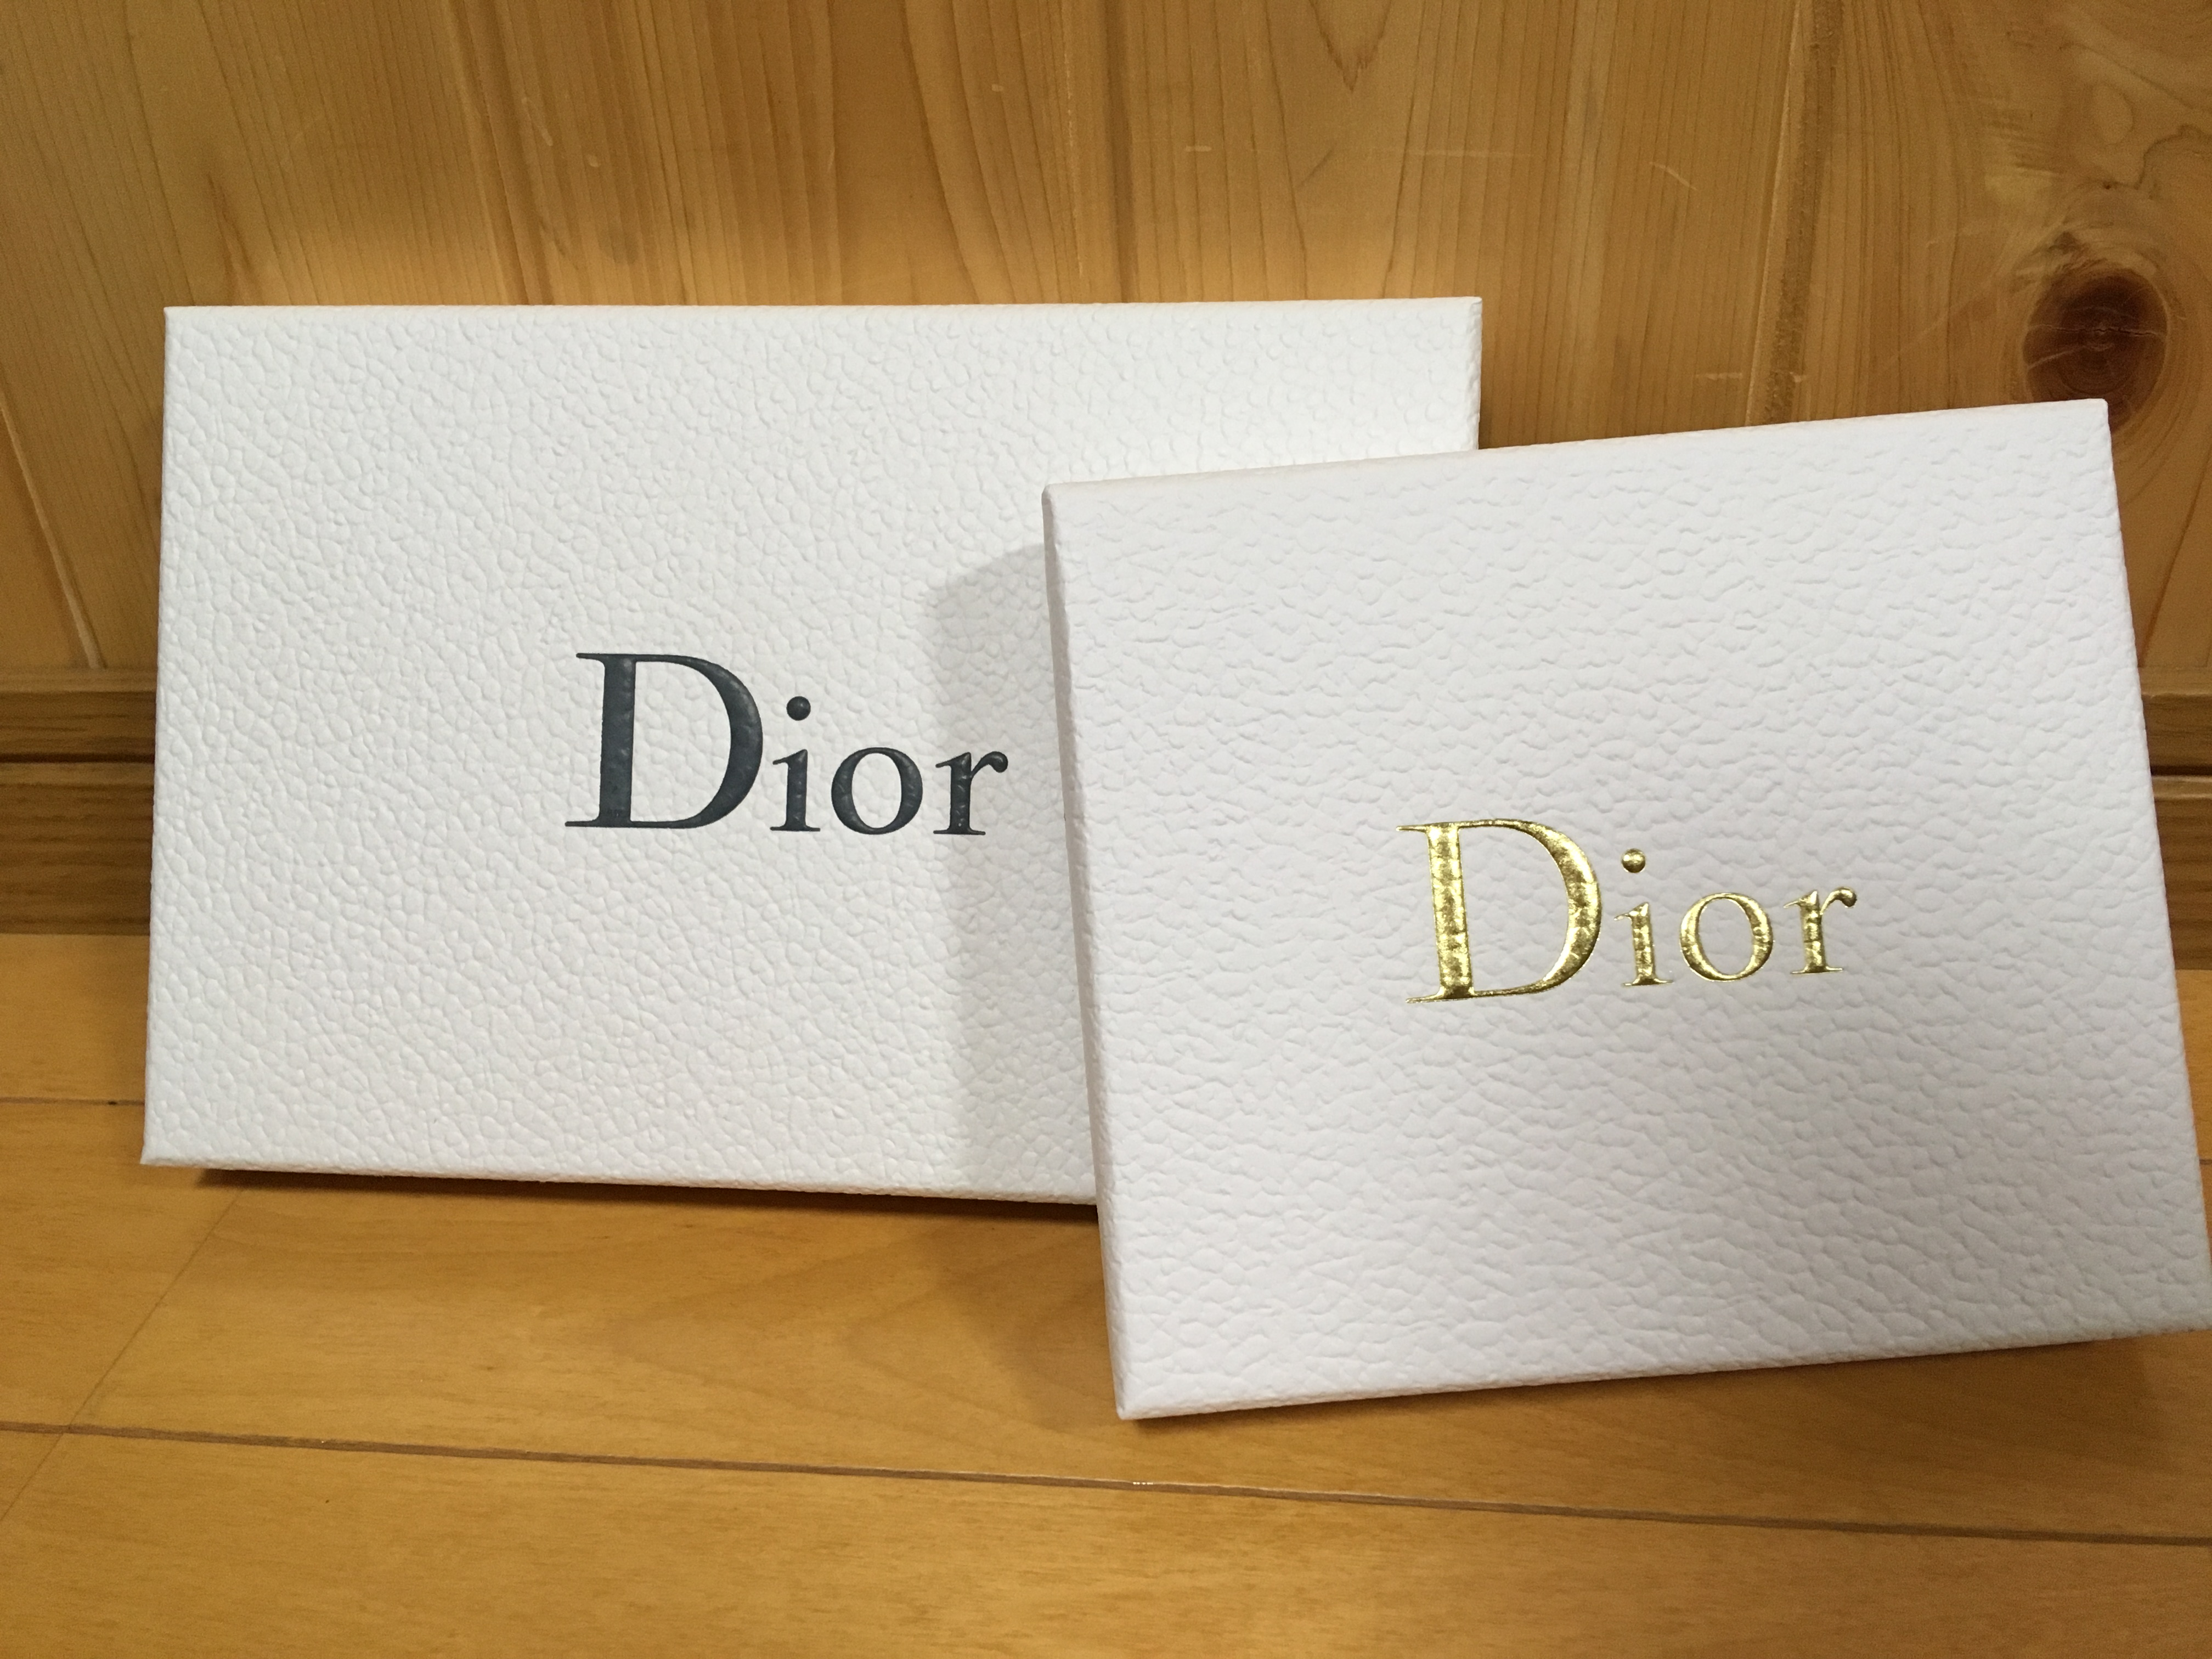 Dior ディオール オンラインブティック ギフトボックス 2018 クリスマス